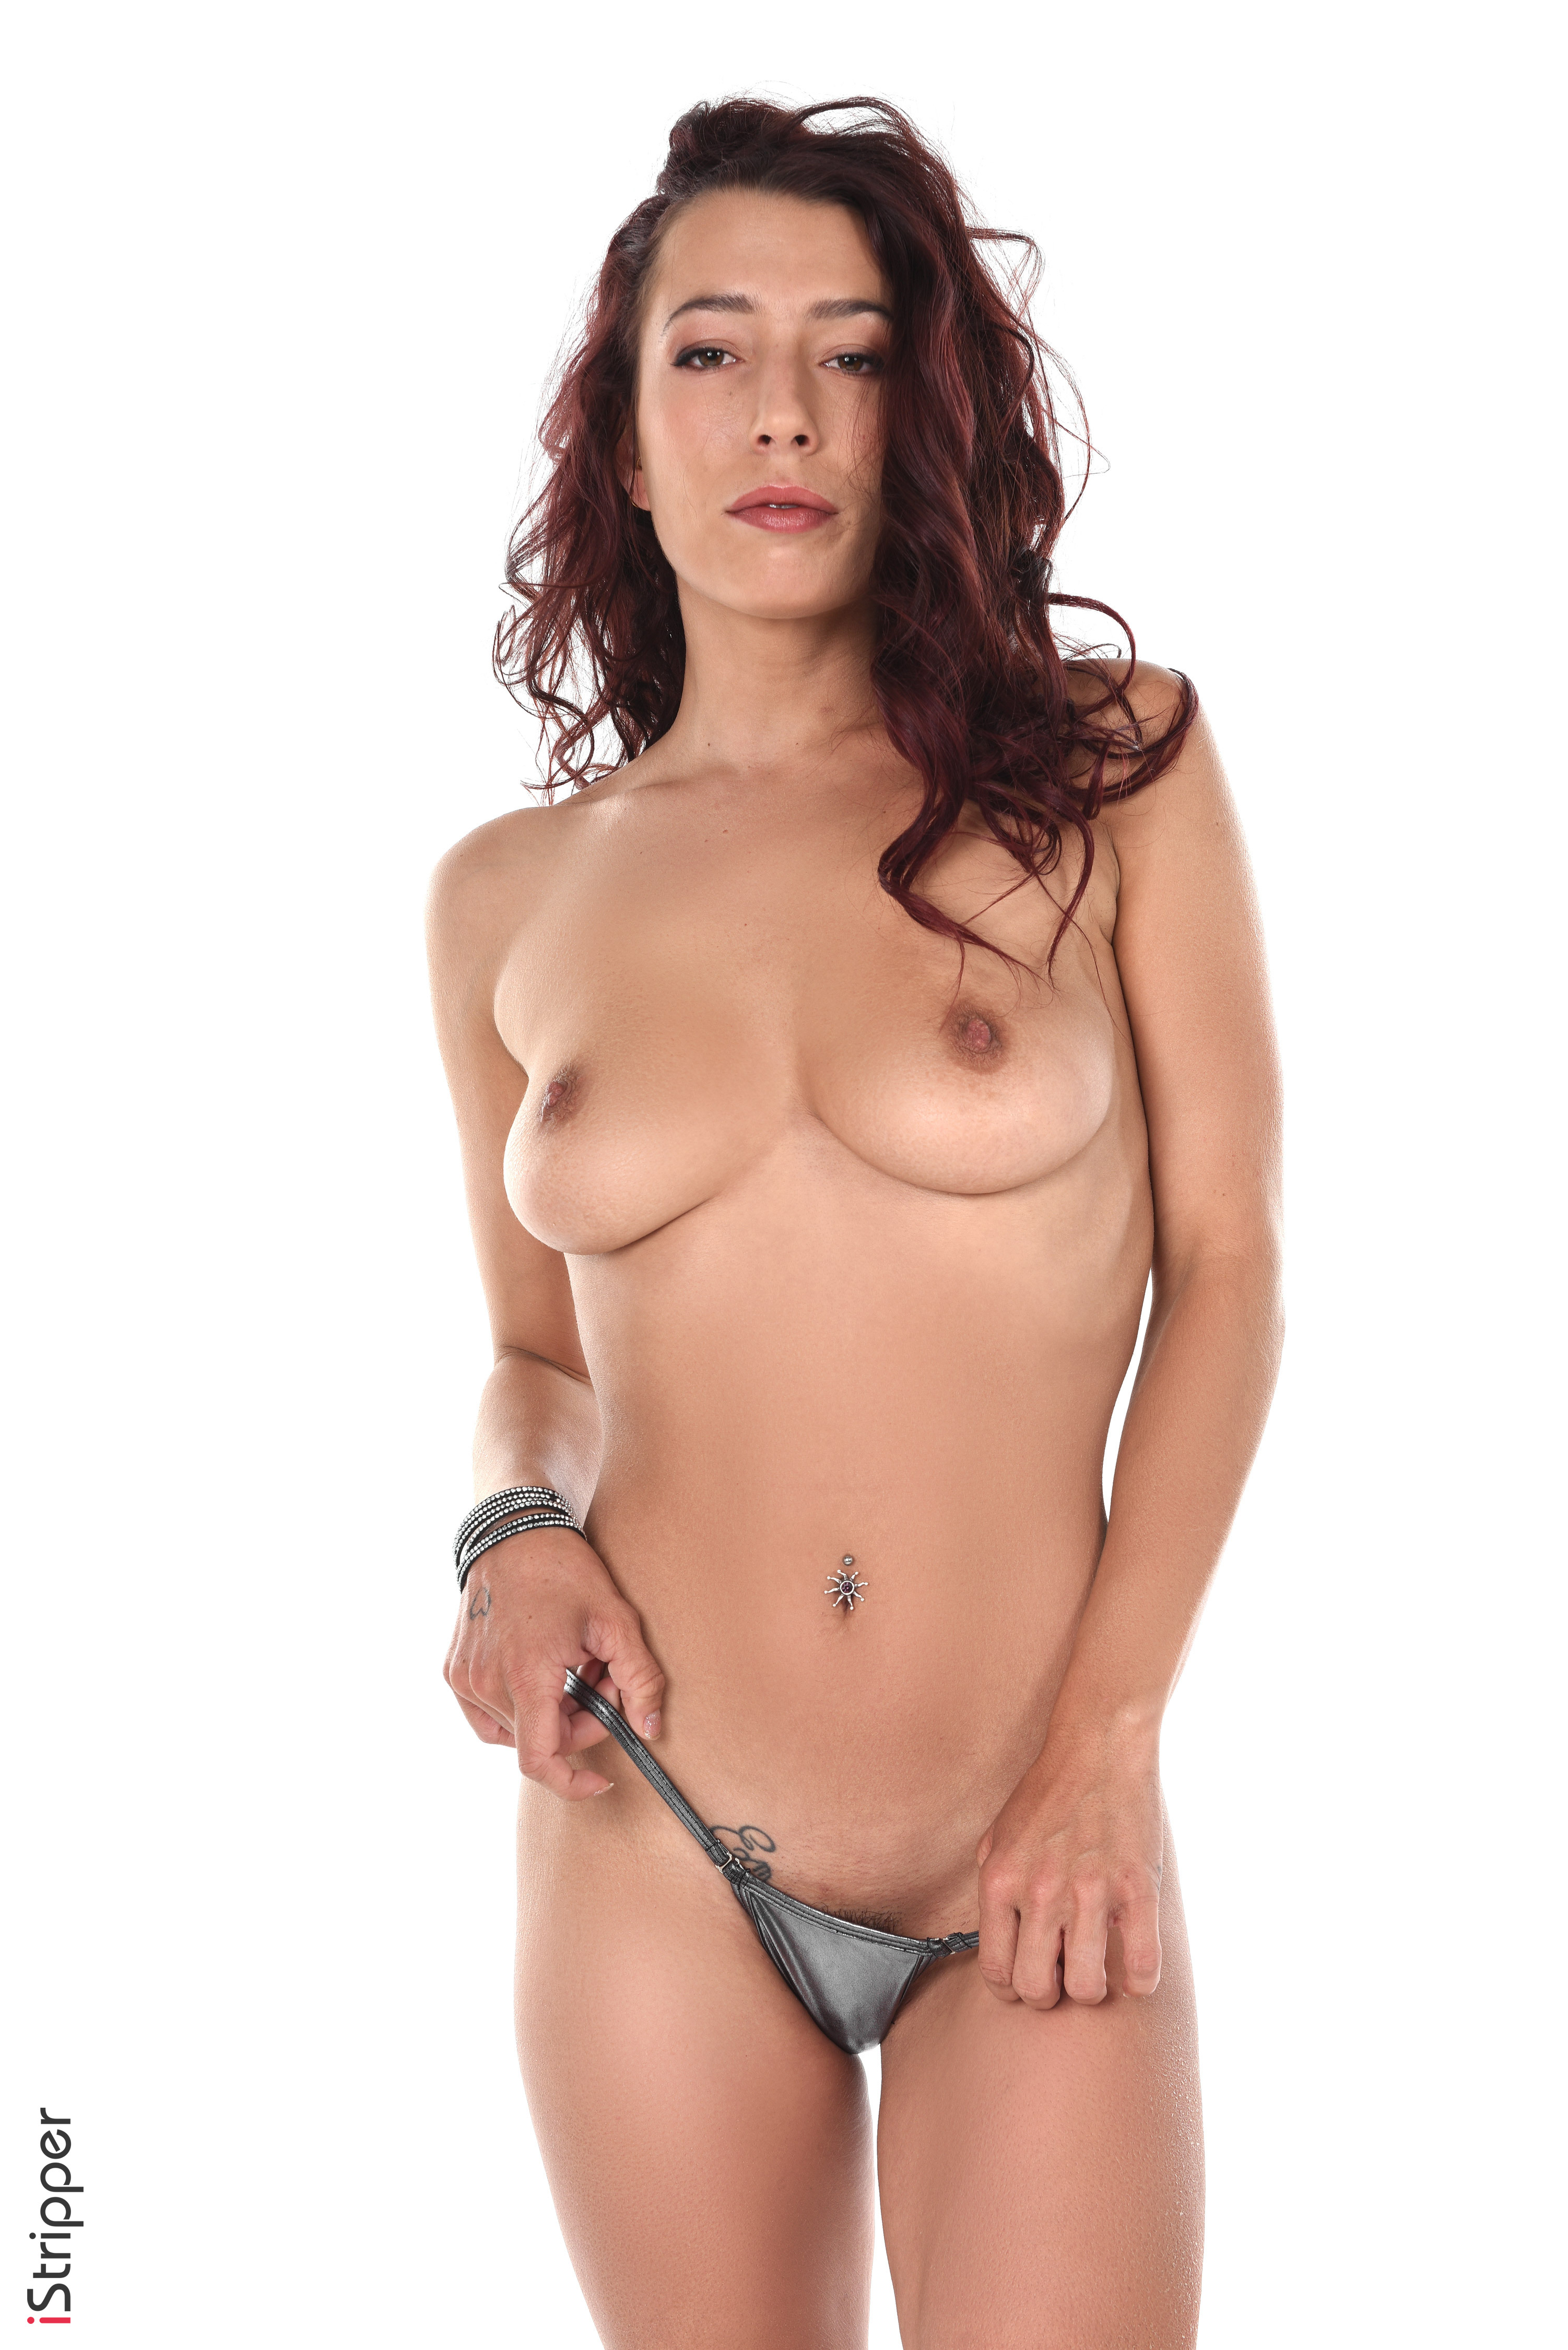 nude emo girl wallpapers